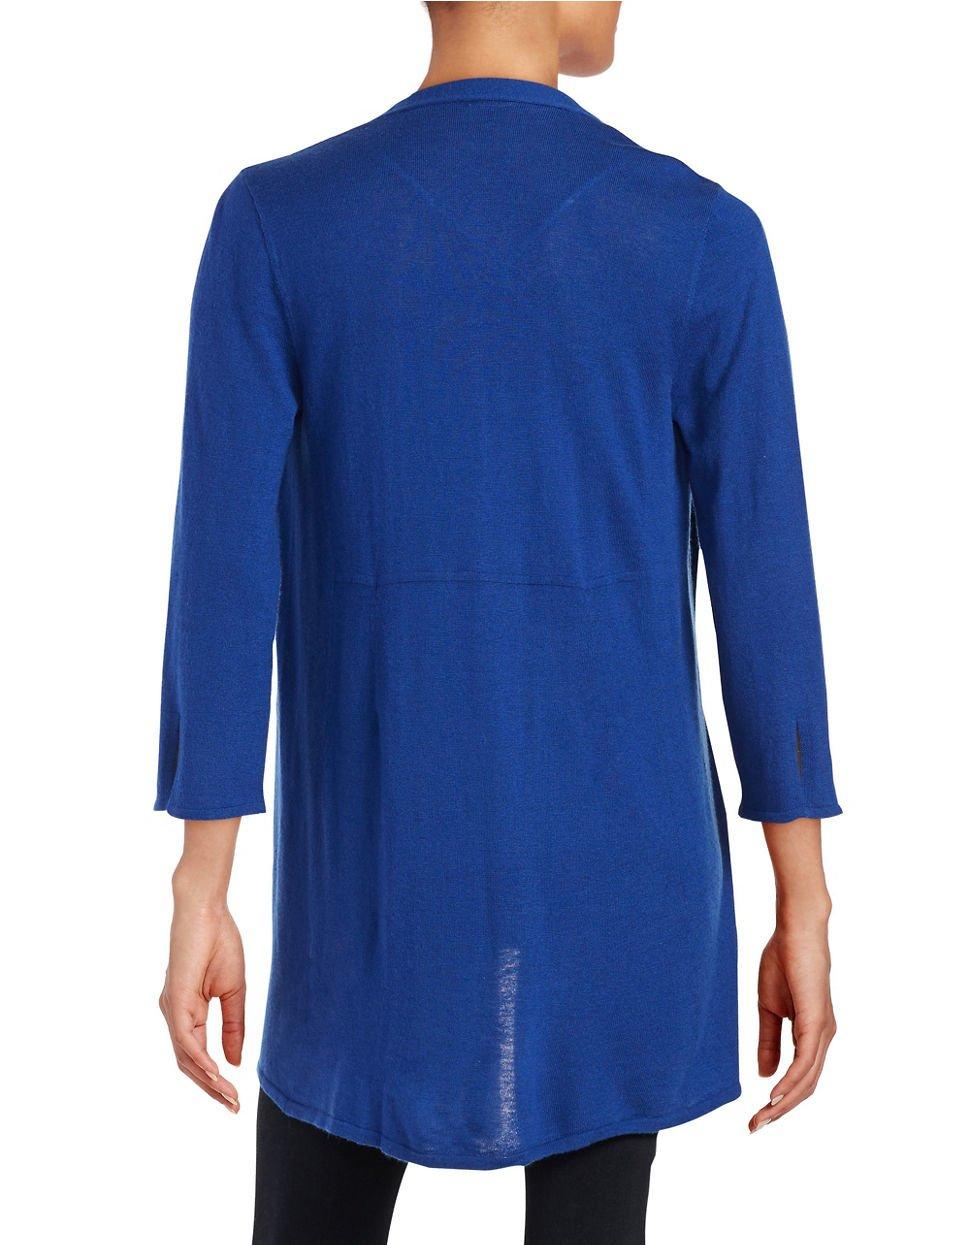 Anne klein Chiffon Open-front Cardigan in Blue | Lyst